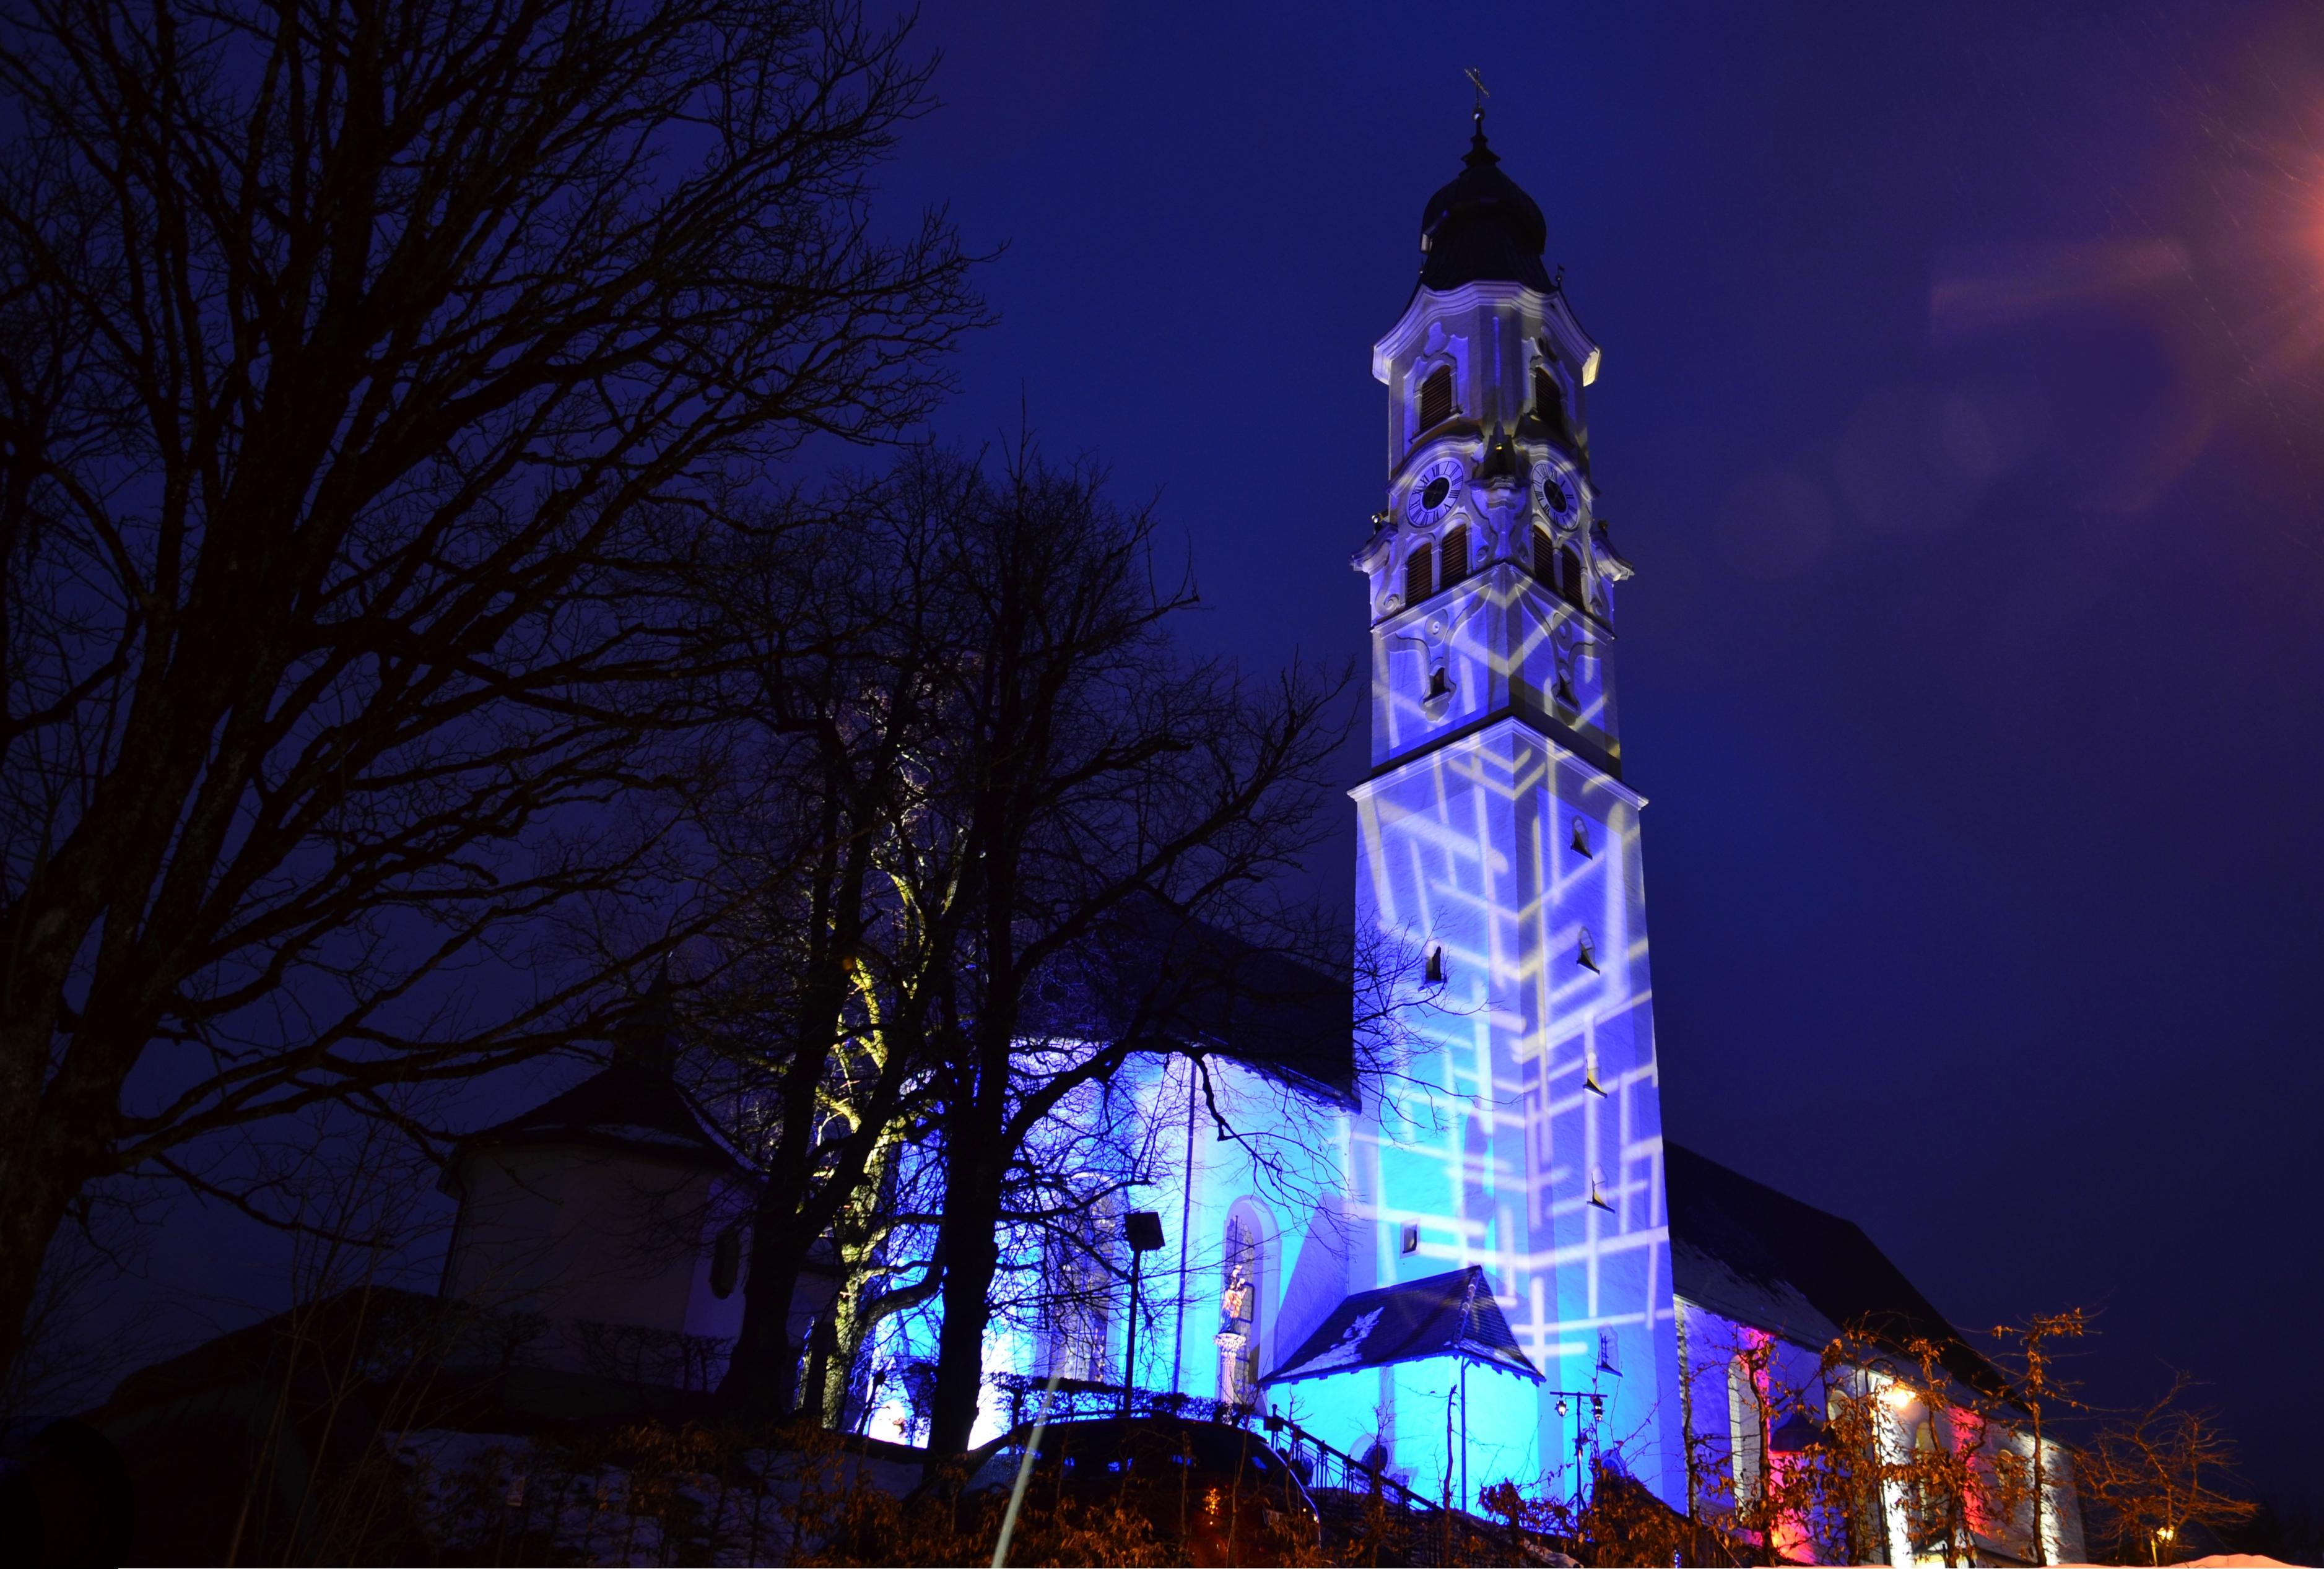 W0223 St. Nikolaus Pfronten.jpg